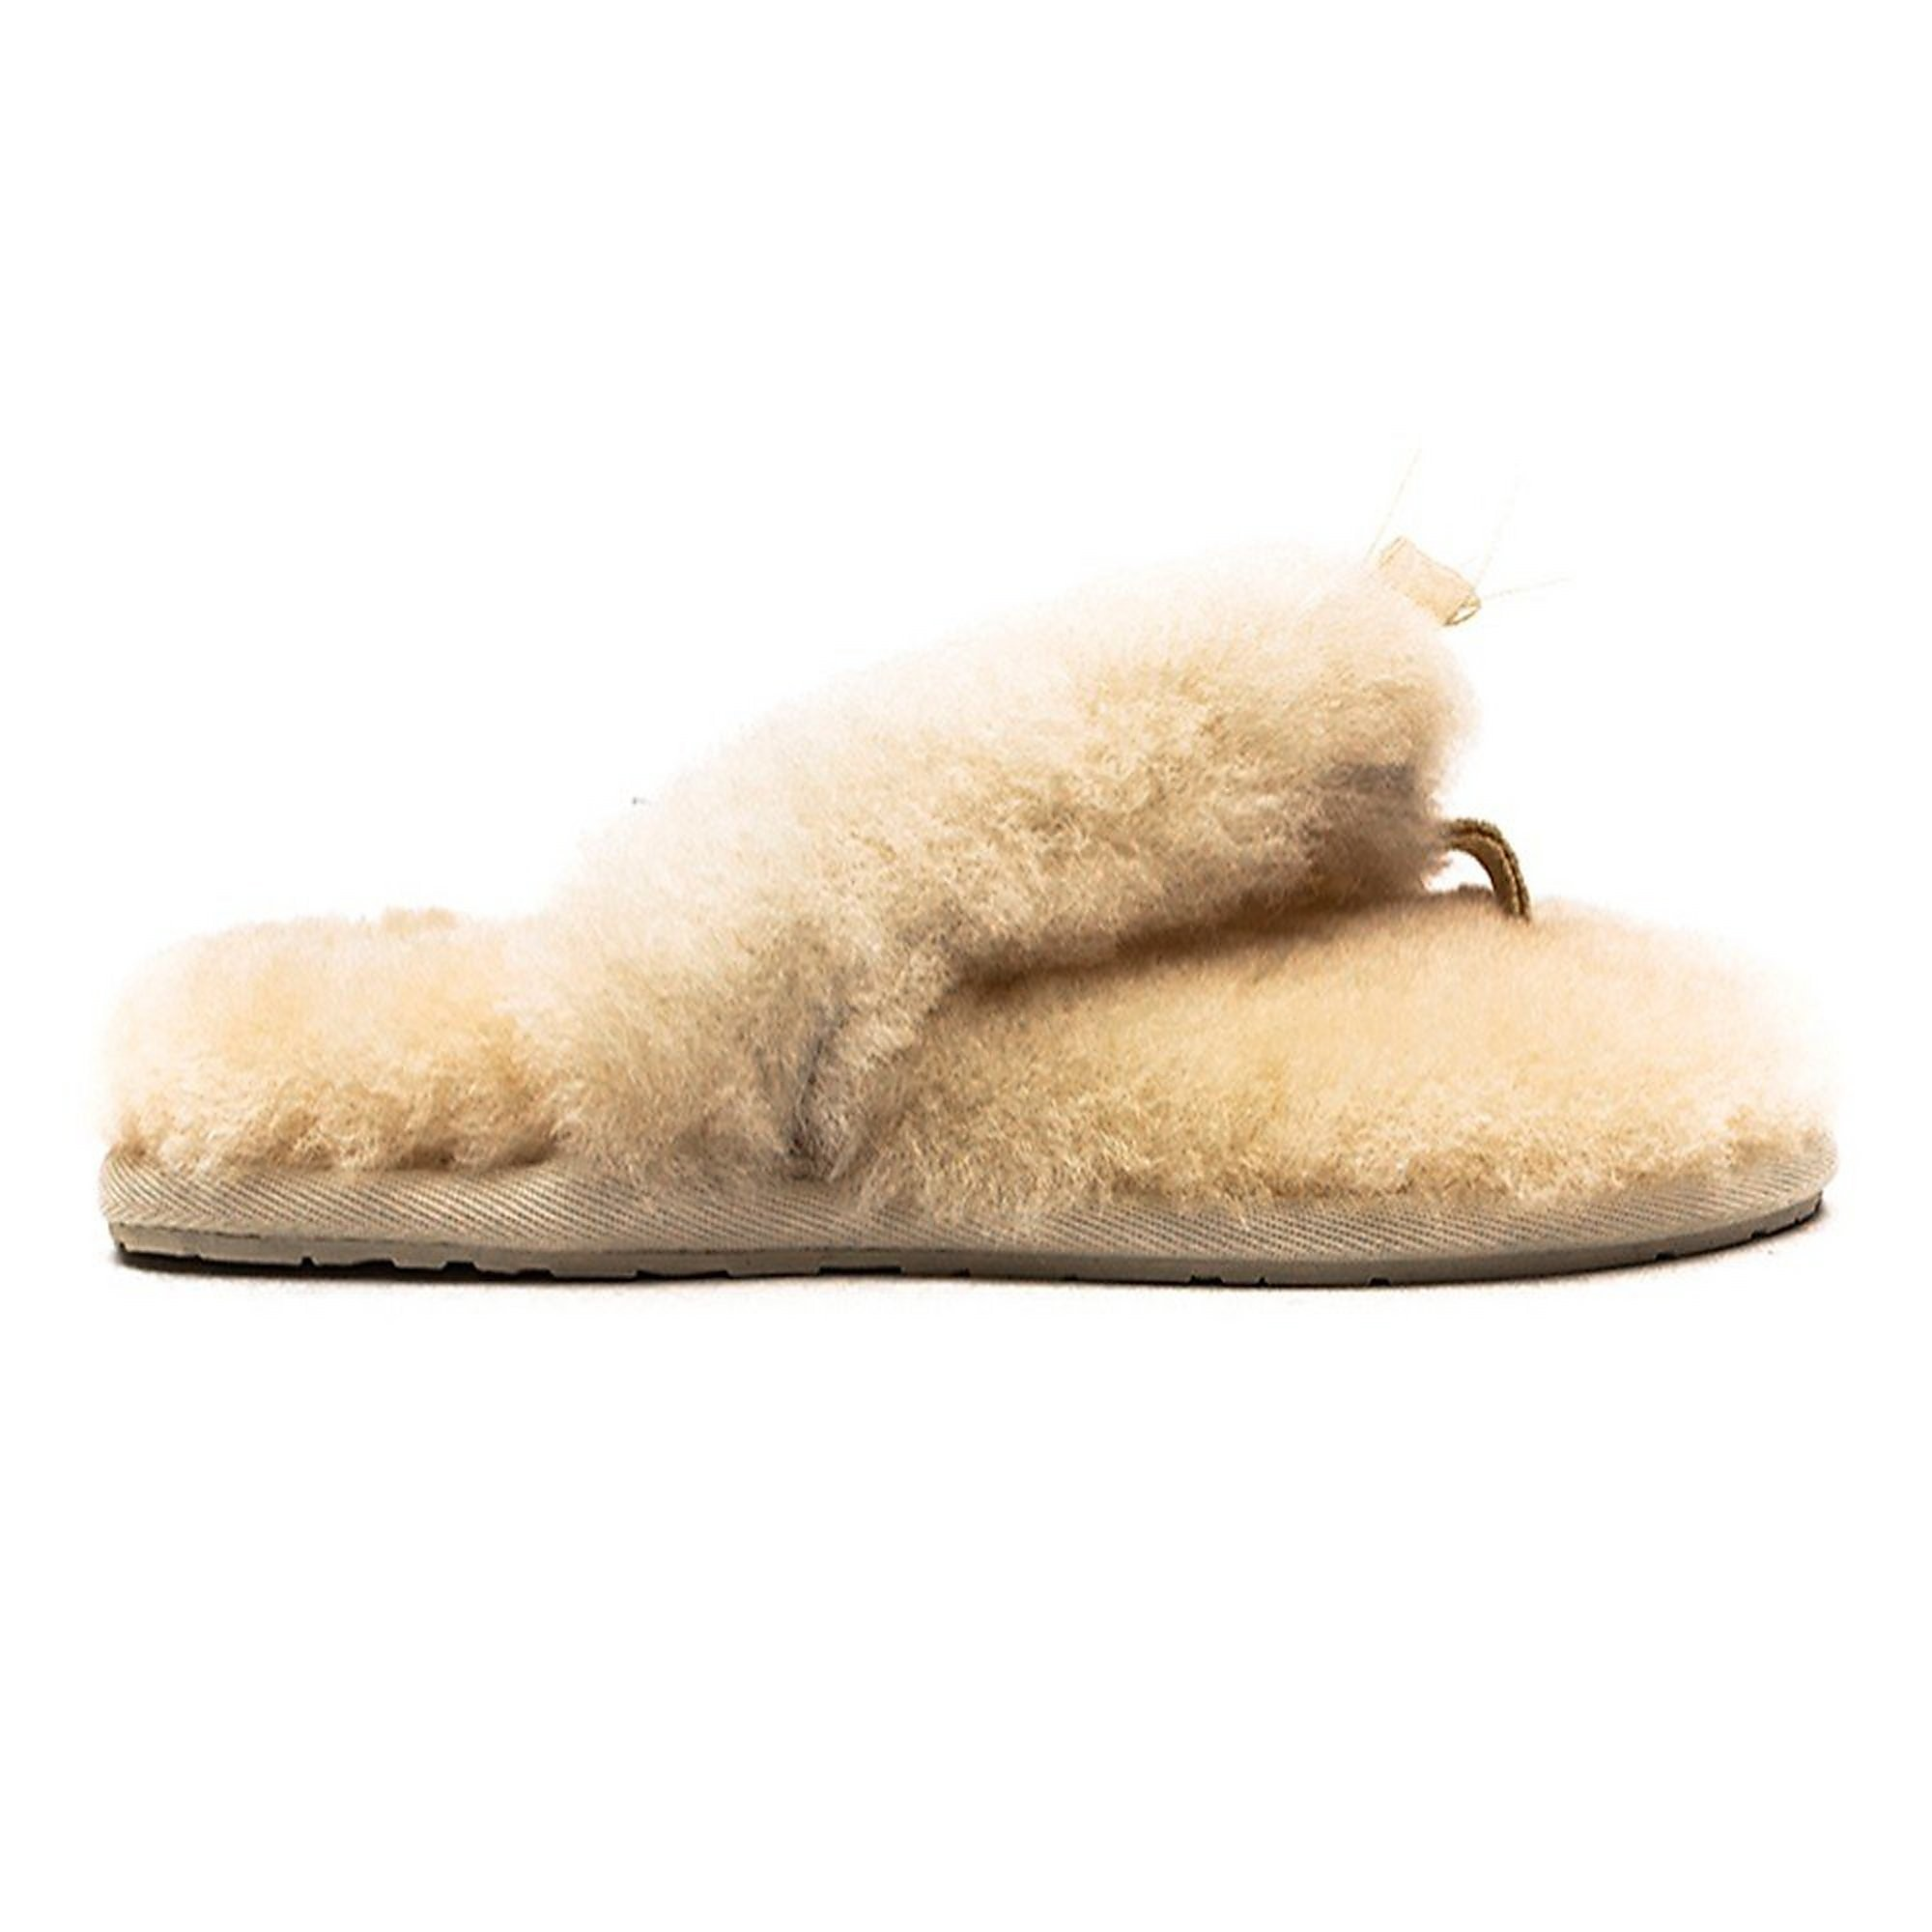 UGG Women's Fluff Flip Flop II - Cream